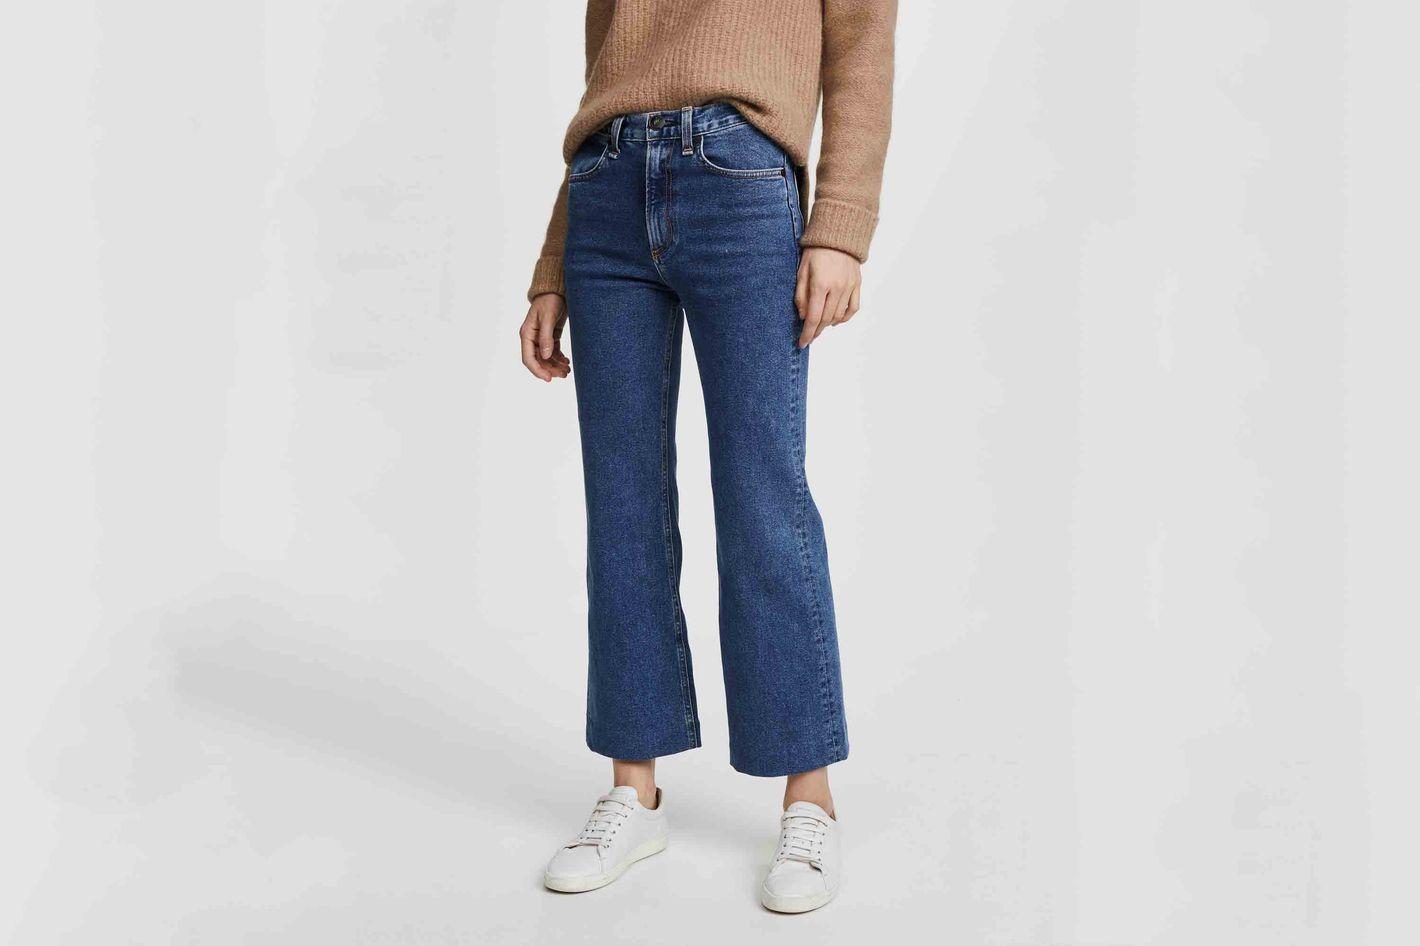 Rag & Bone Jean Ankle Justine Trouser Jeans